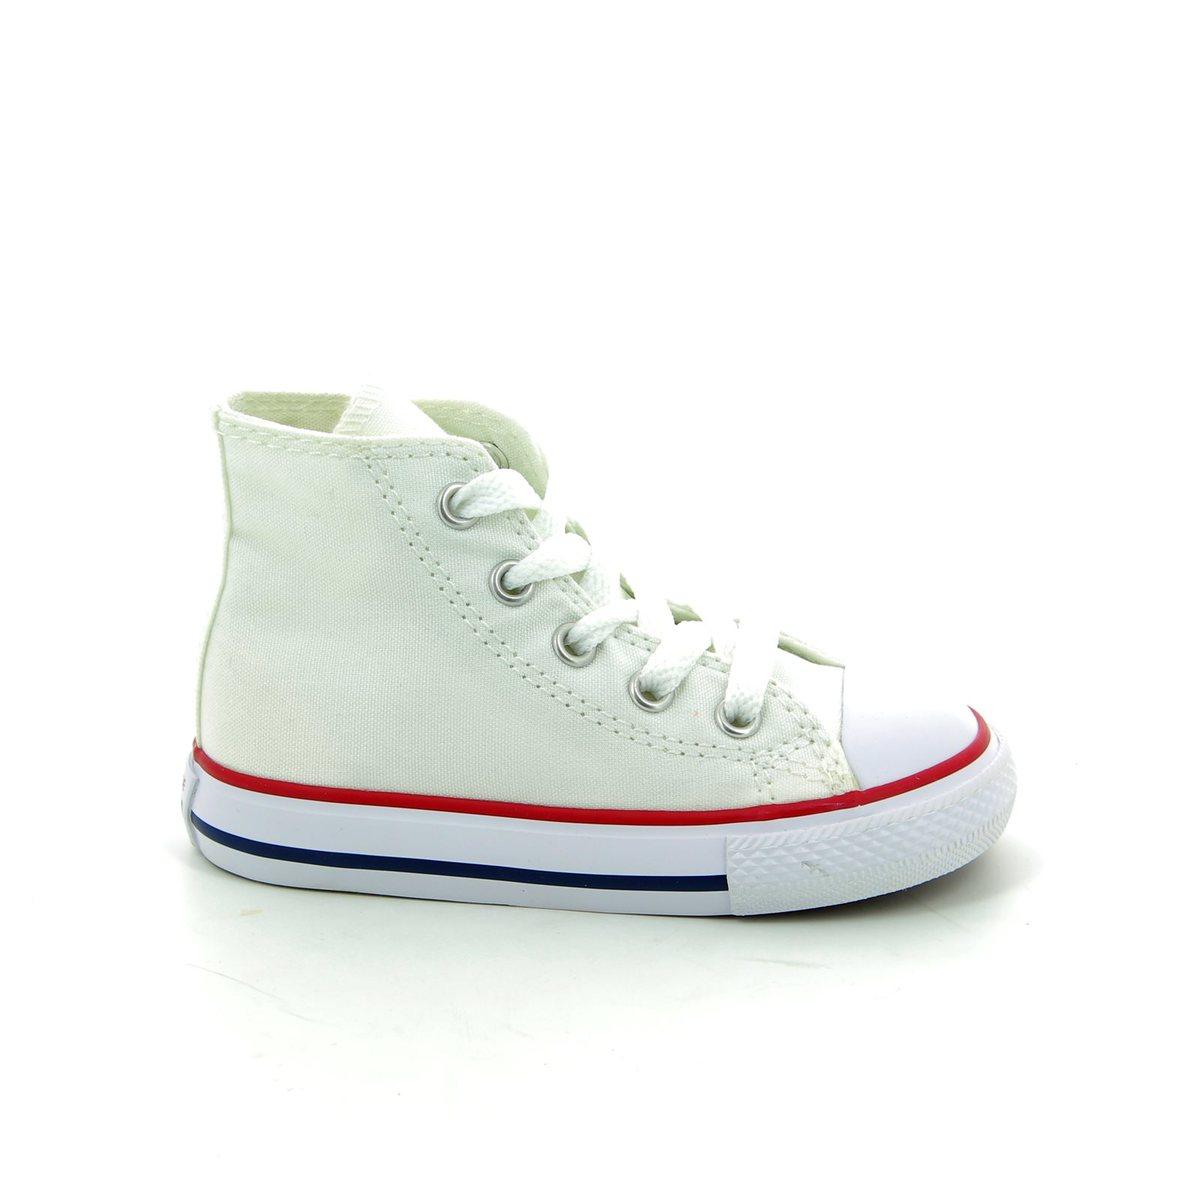 0b722a3e689 Converse Trainers - White - 7J253C 102 Infants Chuck Taylor All Star Classic  HI Tops